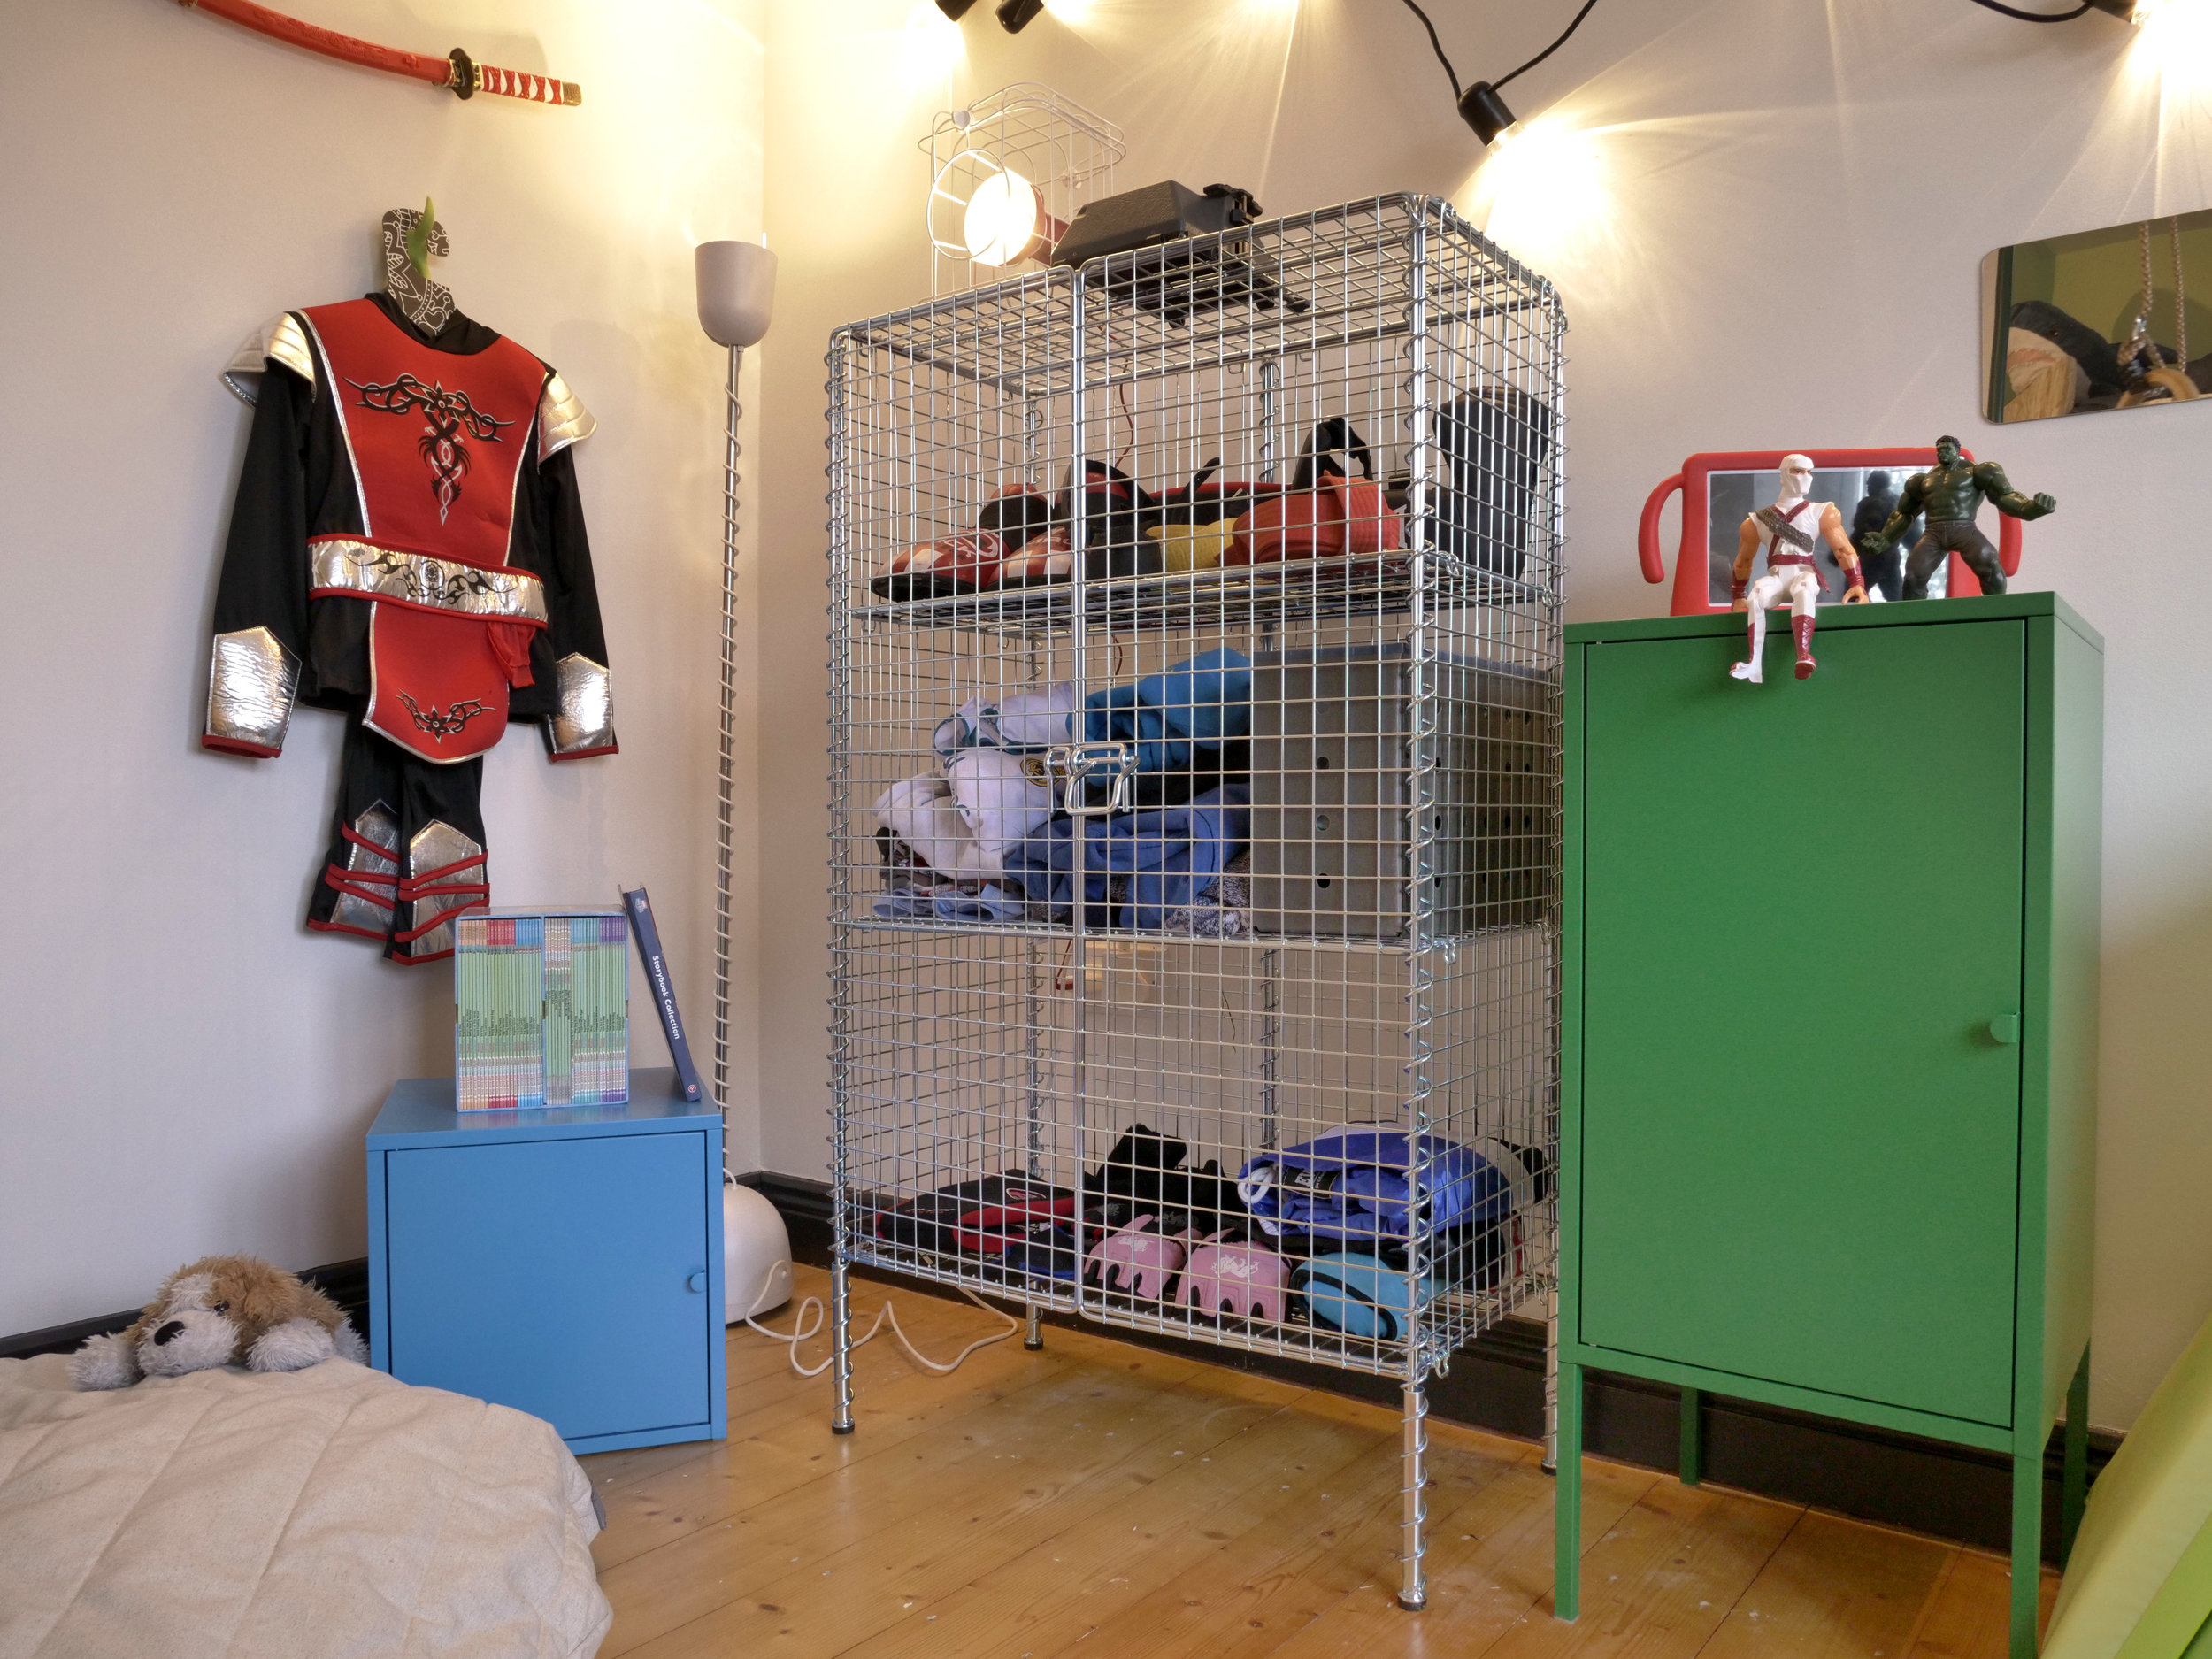 Portlaoise---Boy-Bedroom---After-3.jpg